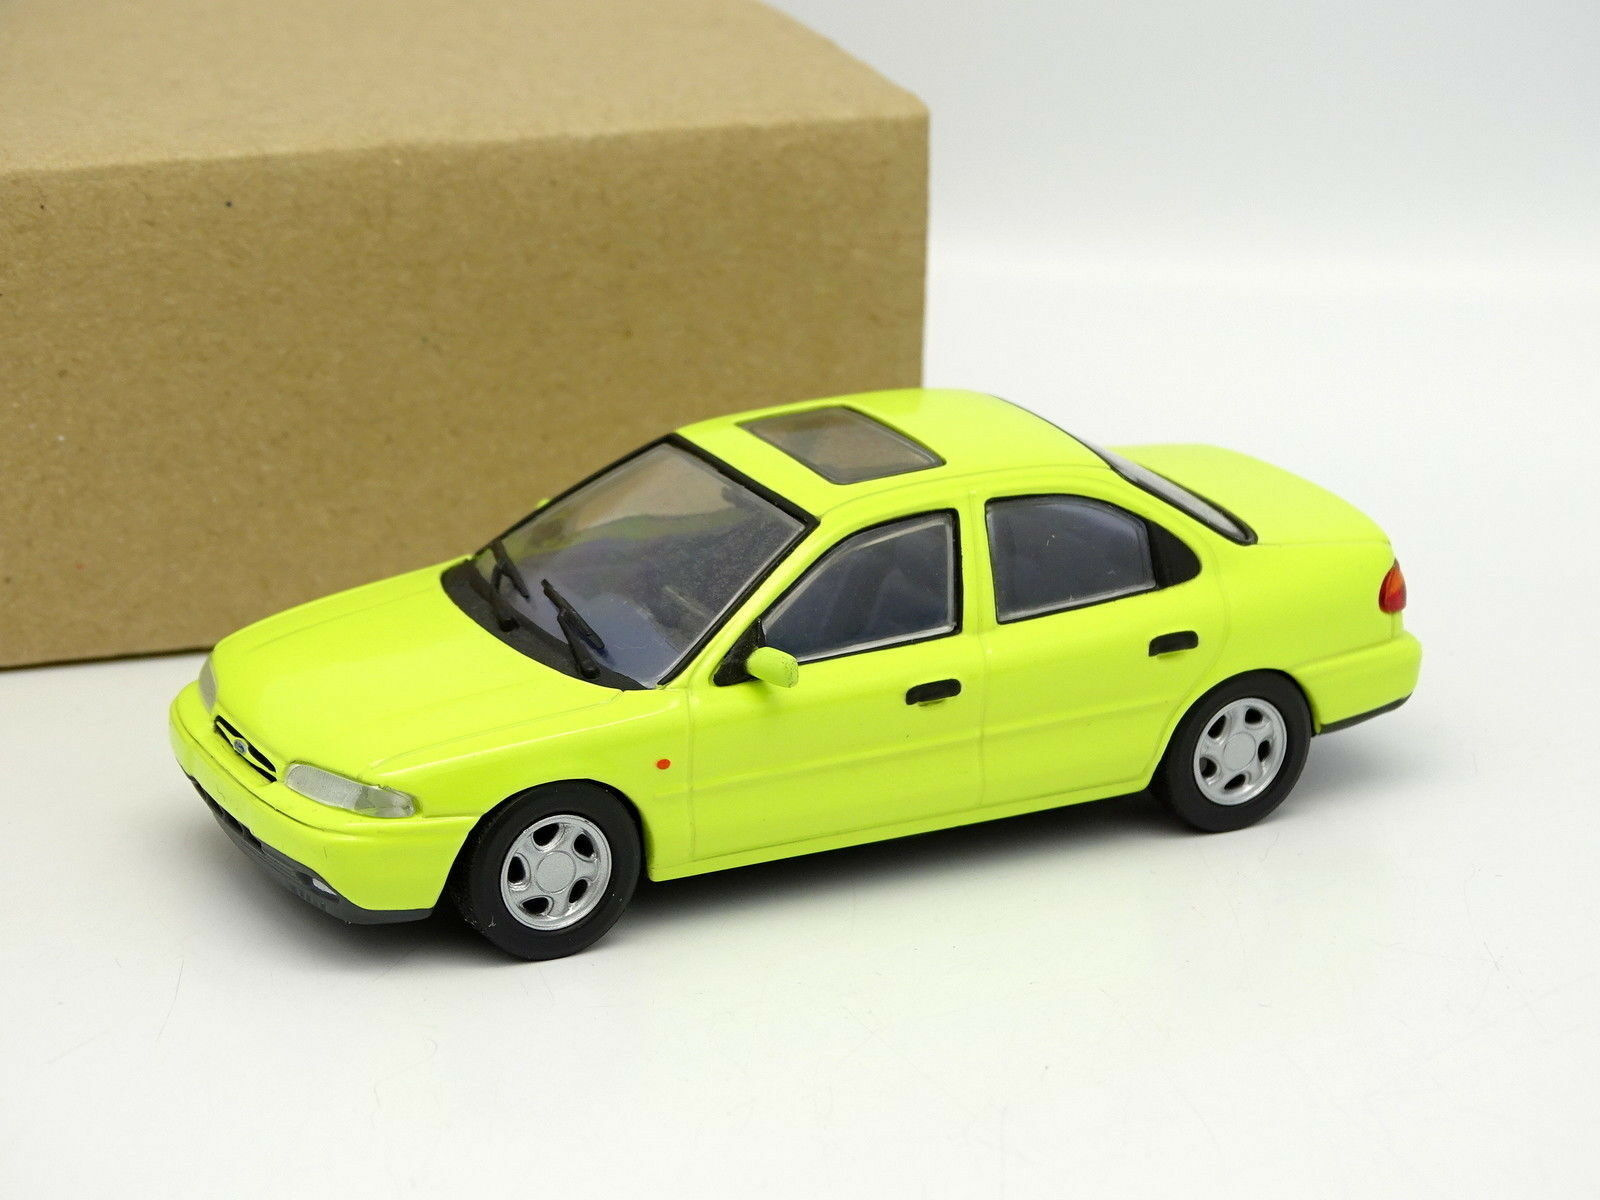 Minichamps SB 1 43 - Ford Mondeo yellow 4 Portes